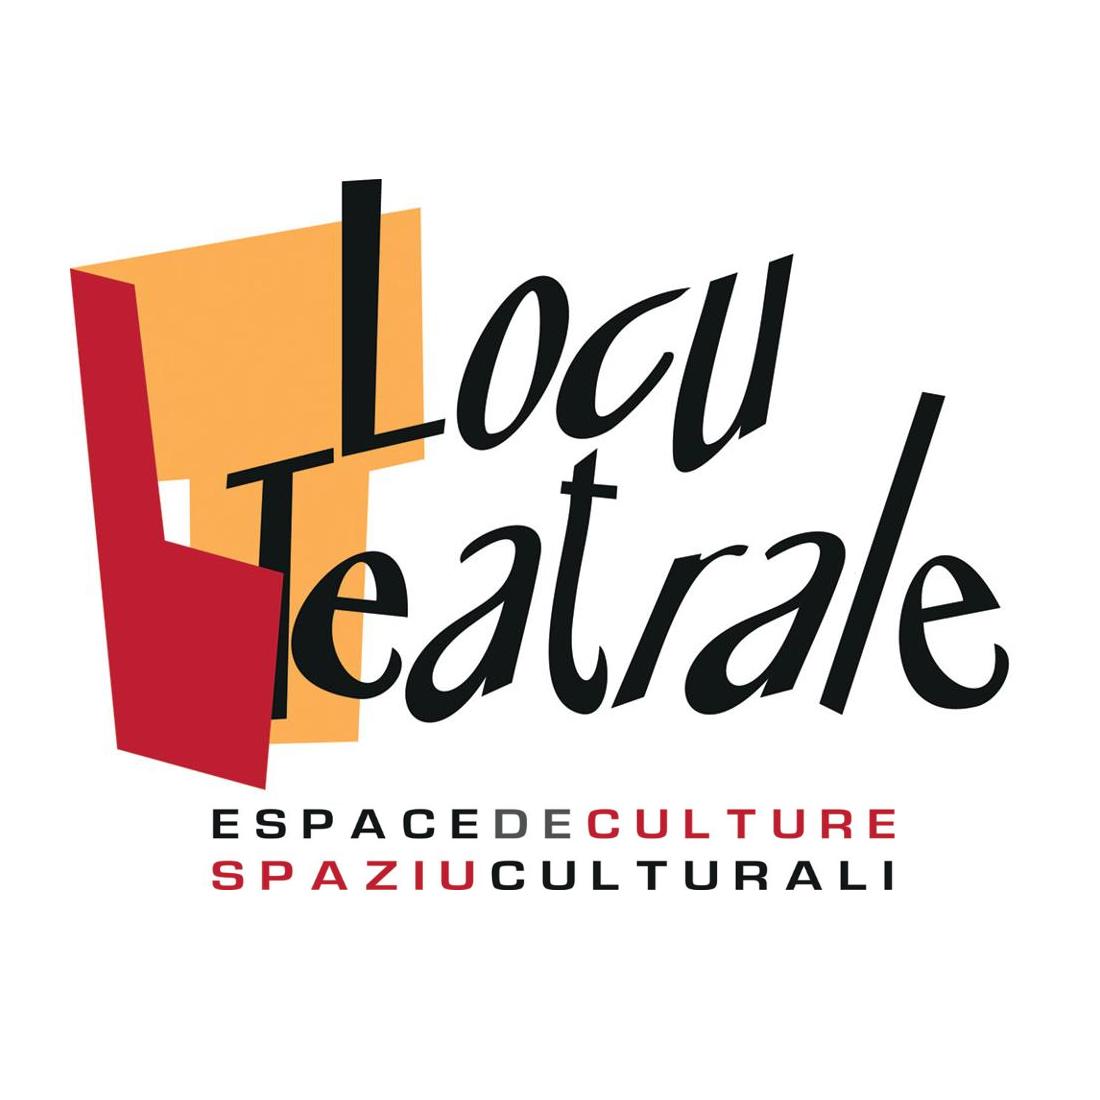 Annulation de la programmation du Spaziu Culturali Locu Teatrale jusqu'au 1er Décembre